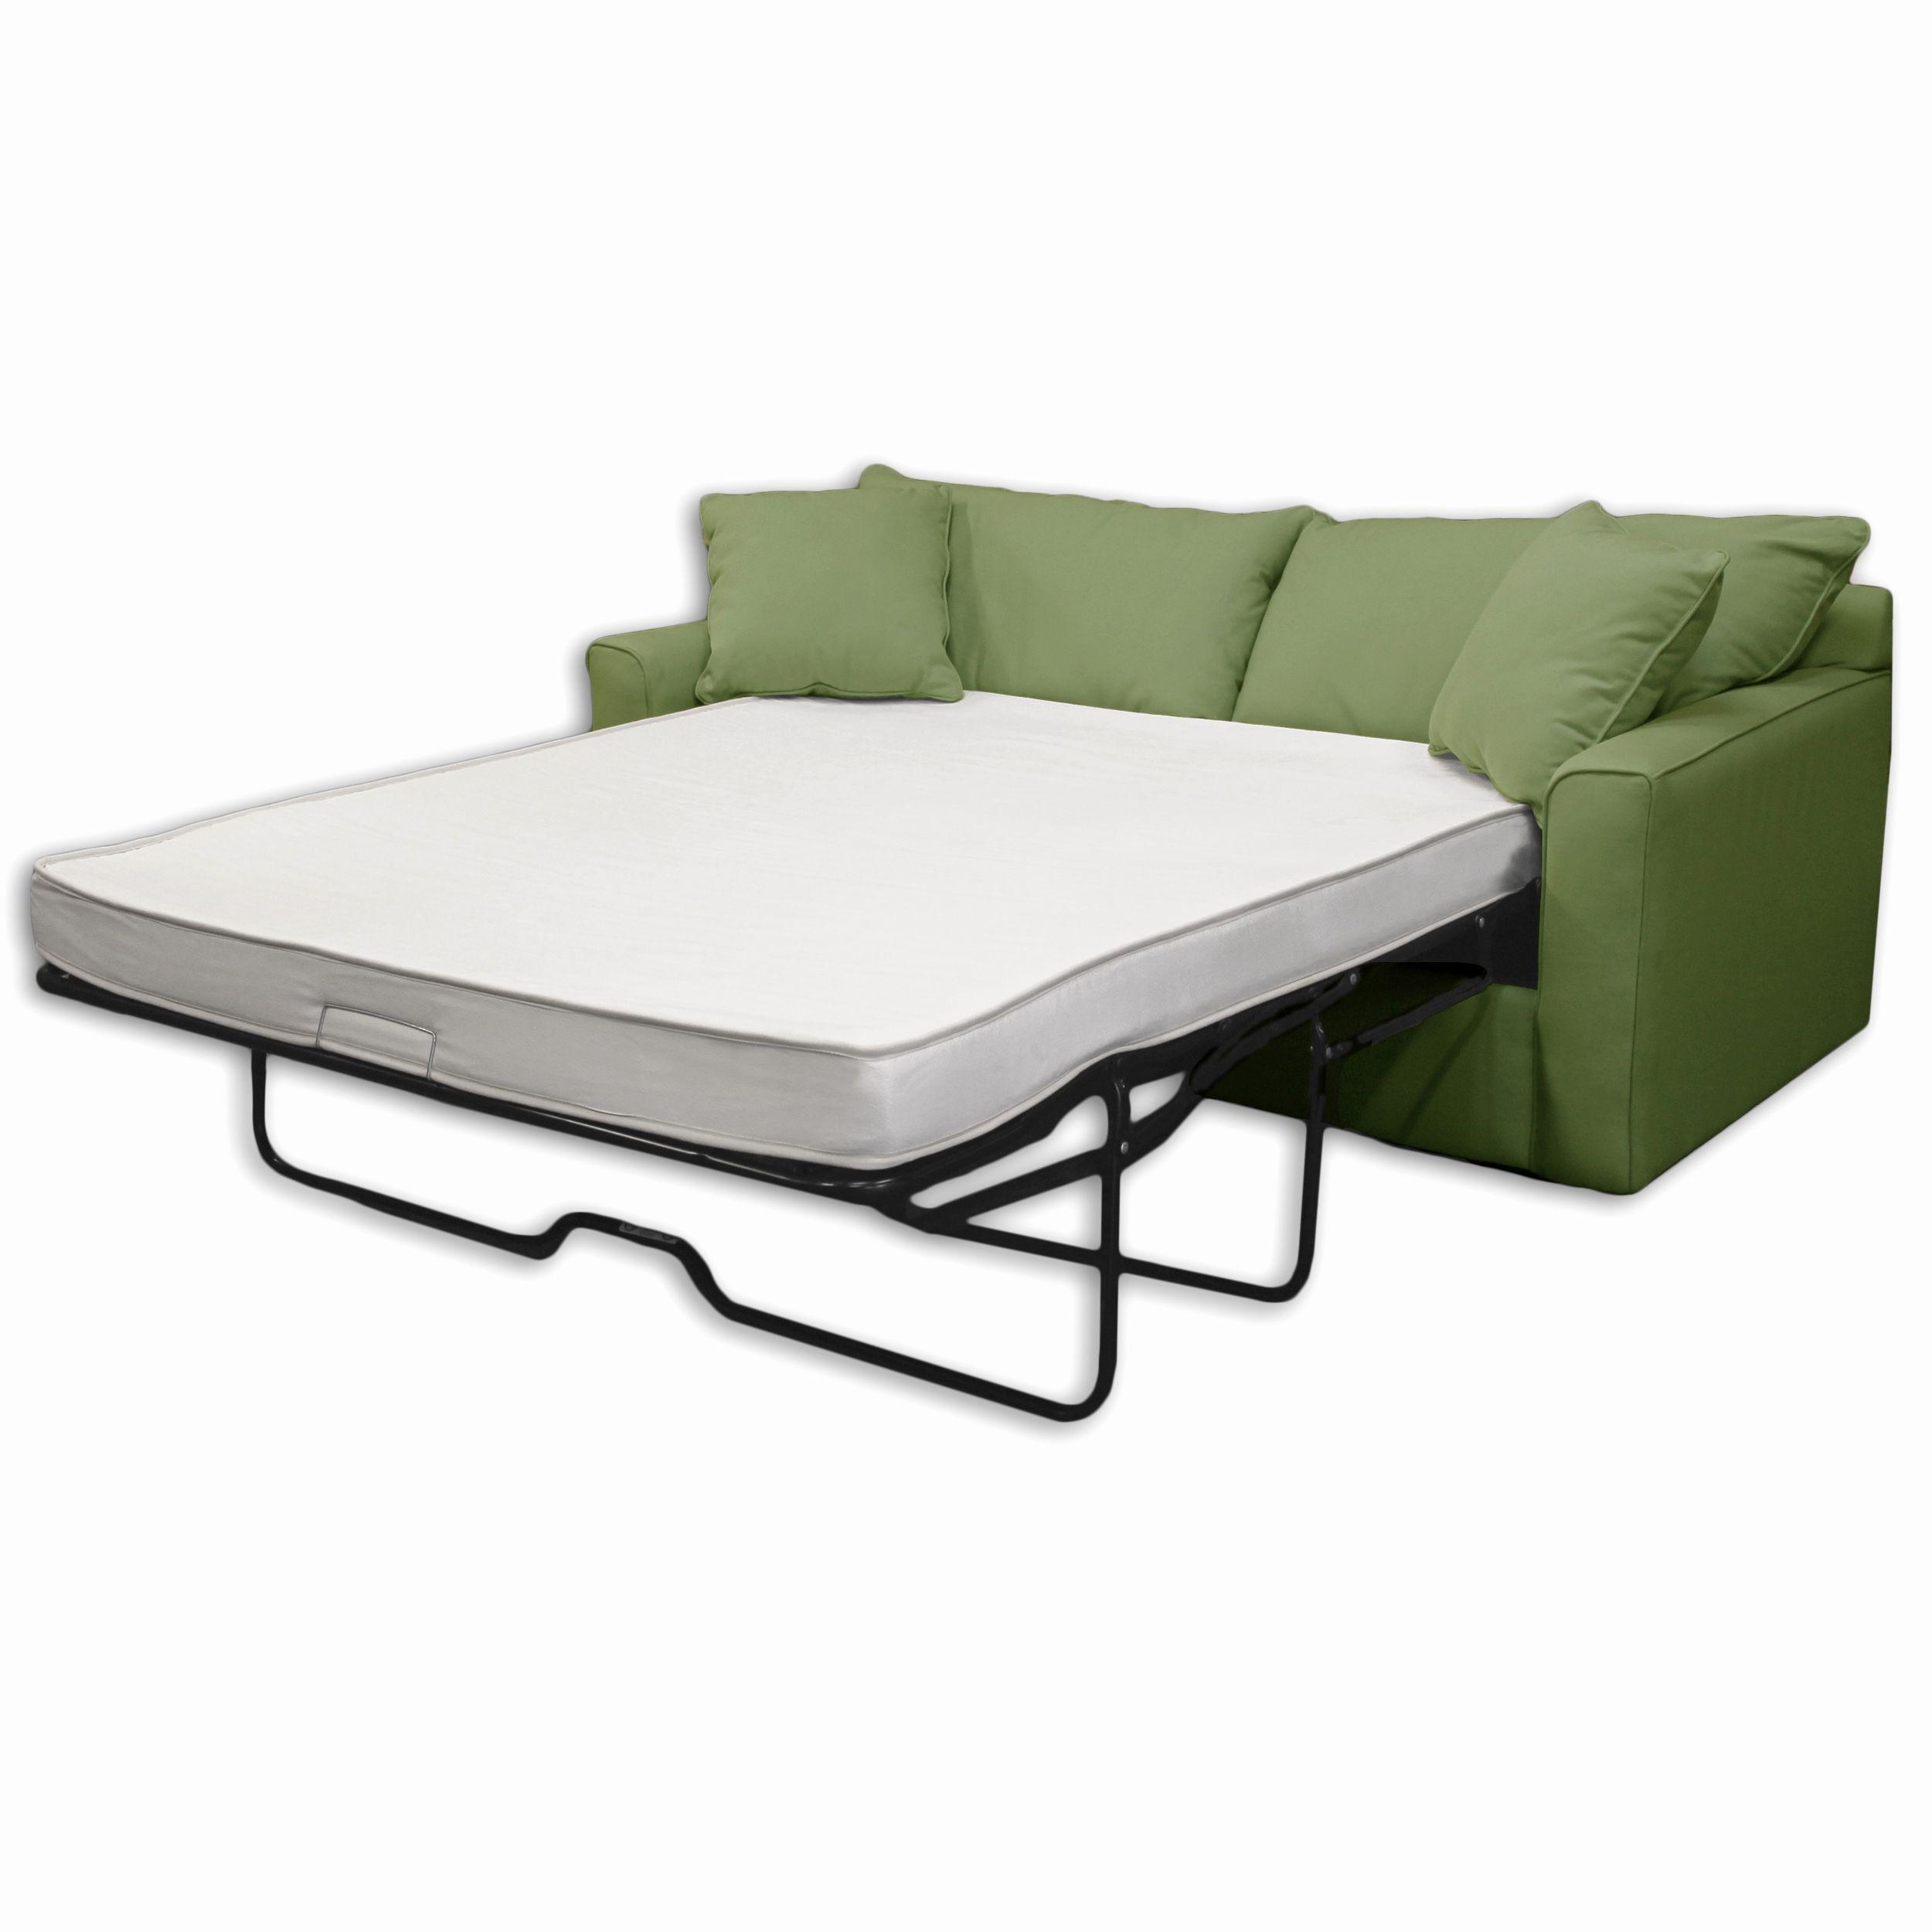 American Signature Furniture Airest Mattresses And Bedding Air